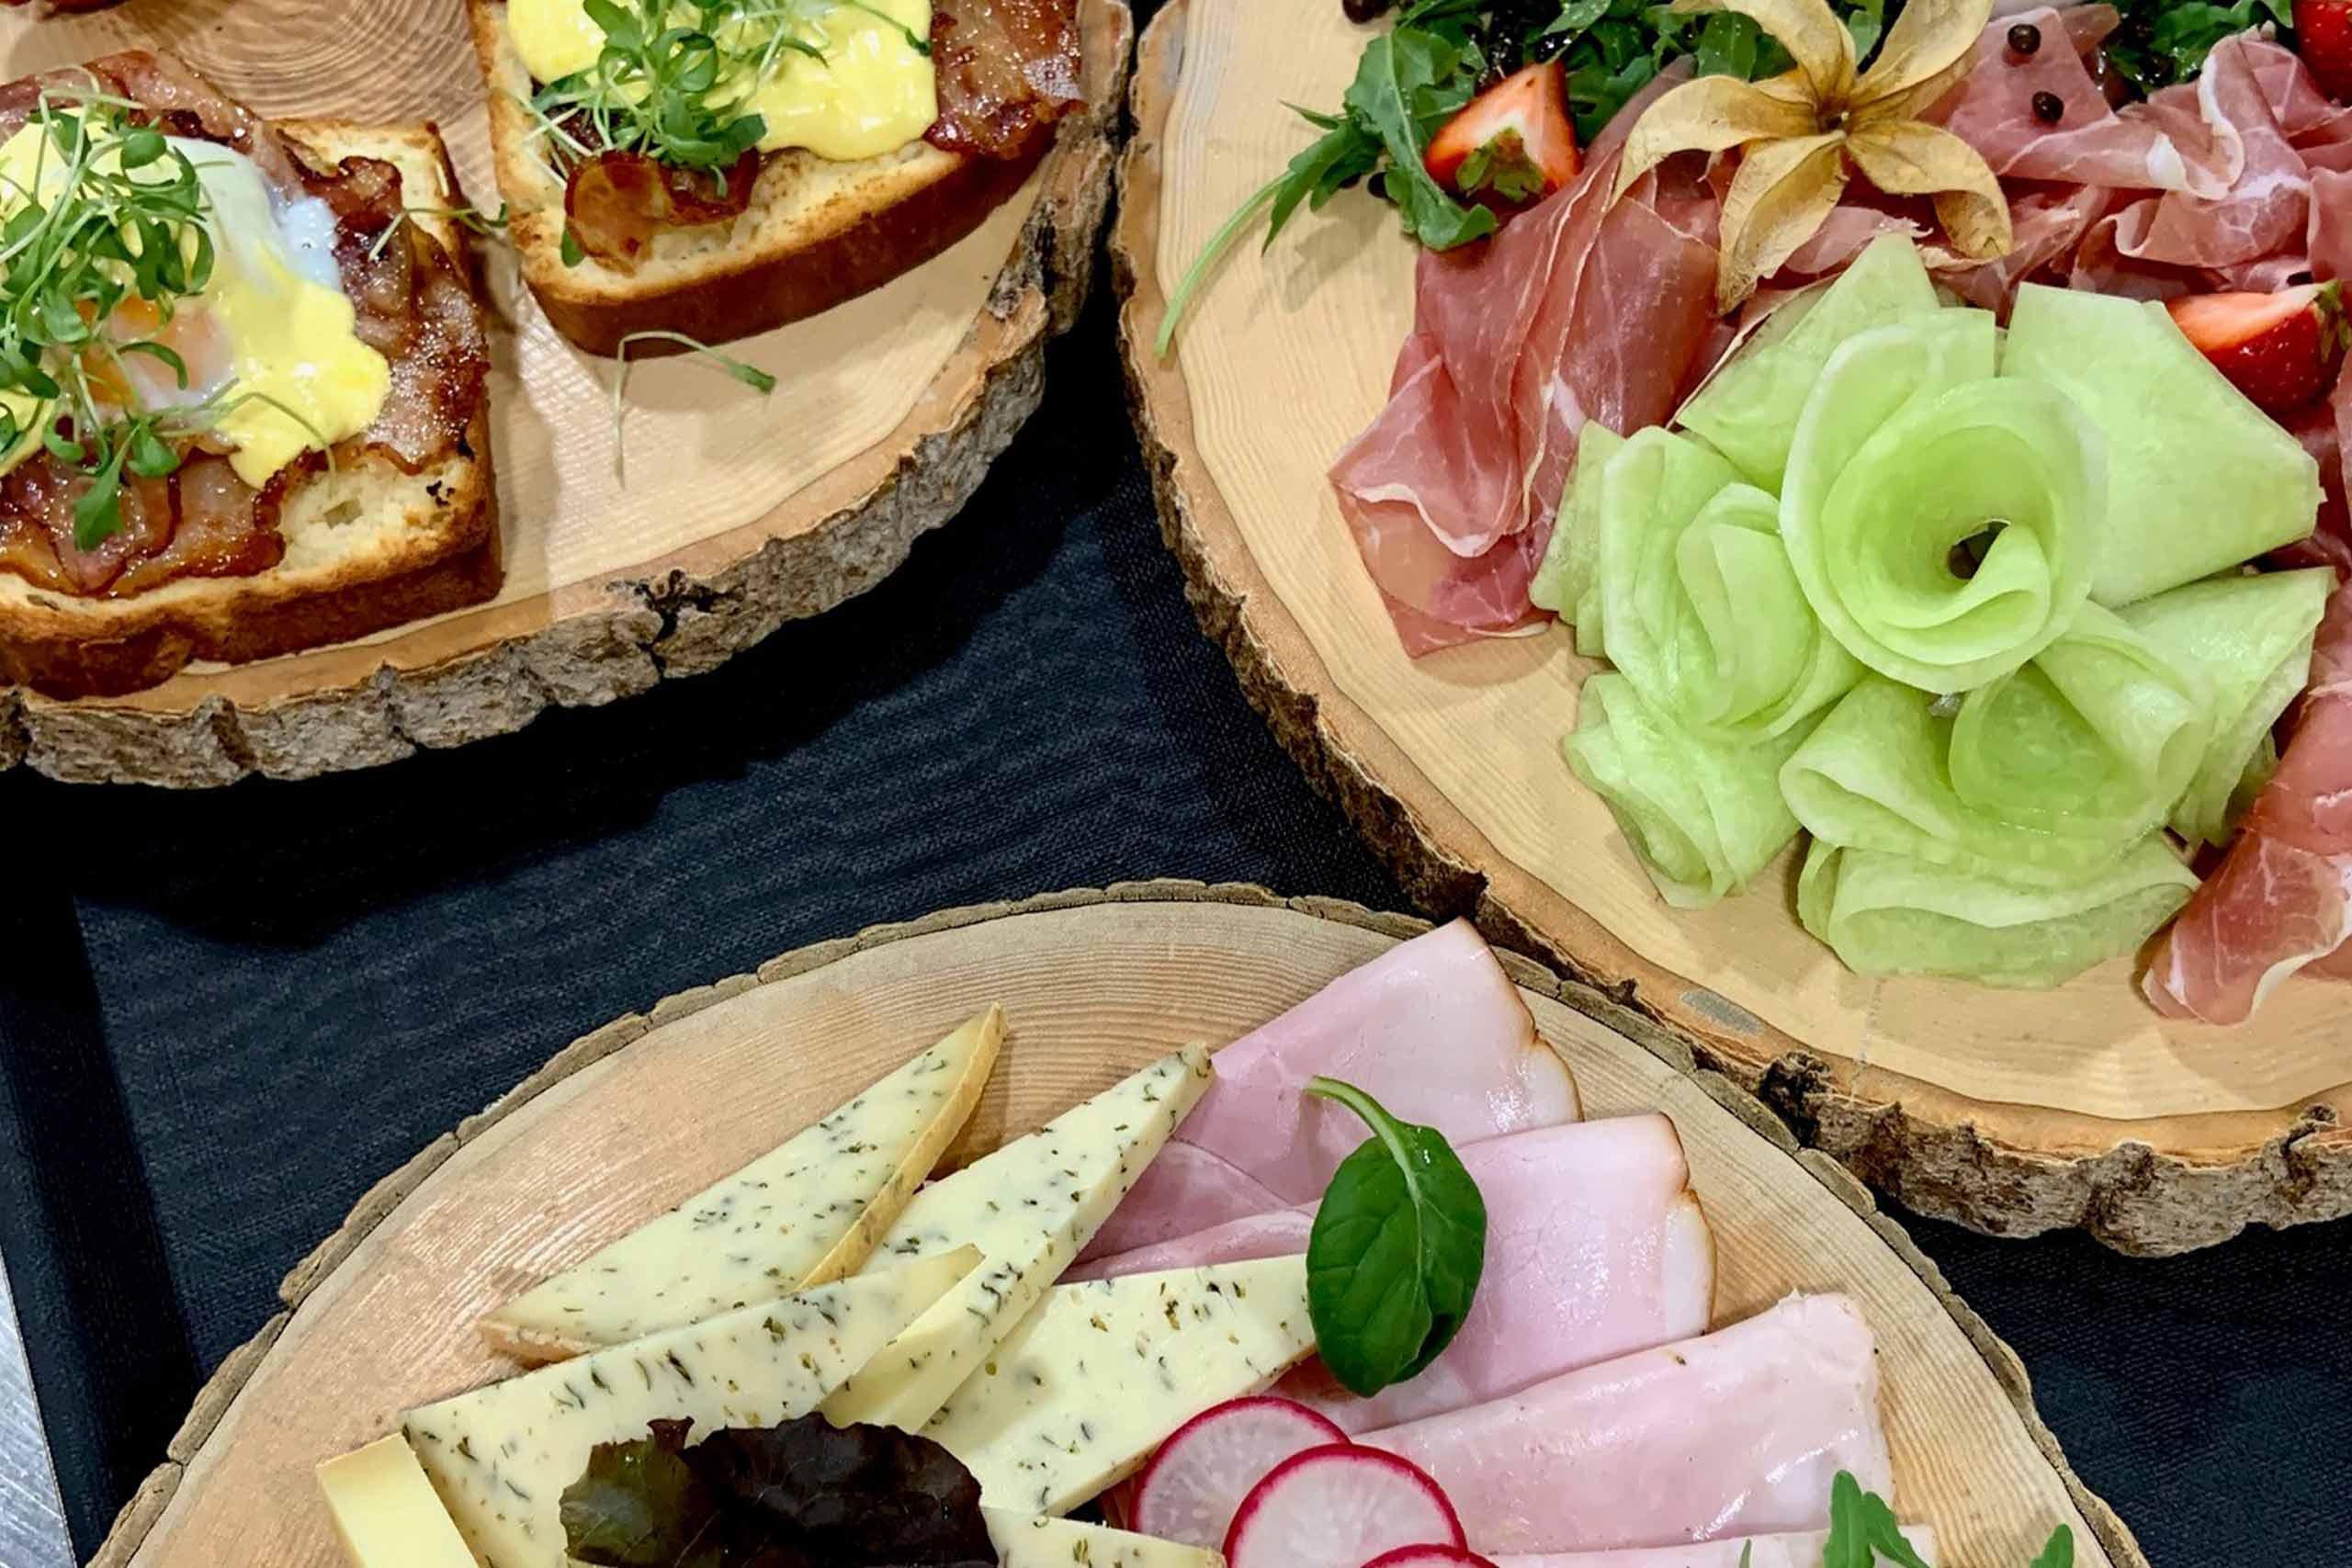 restaurant-taverne-genuss-platte-egg-benedict-burrata-melone-schinken-kaese.jpg